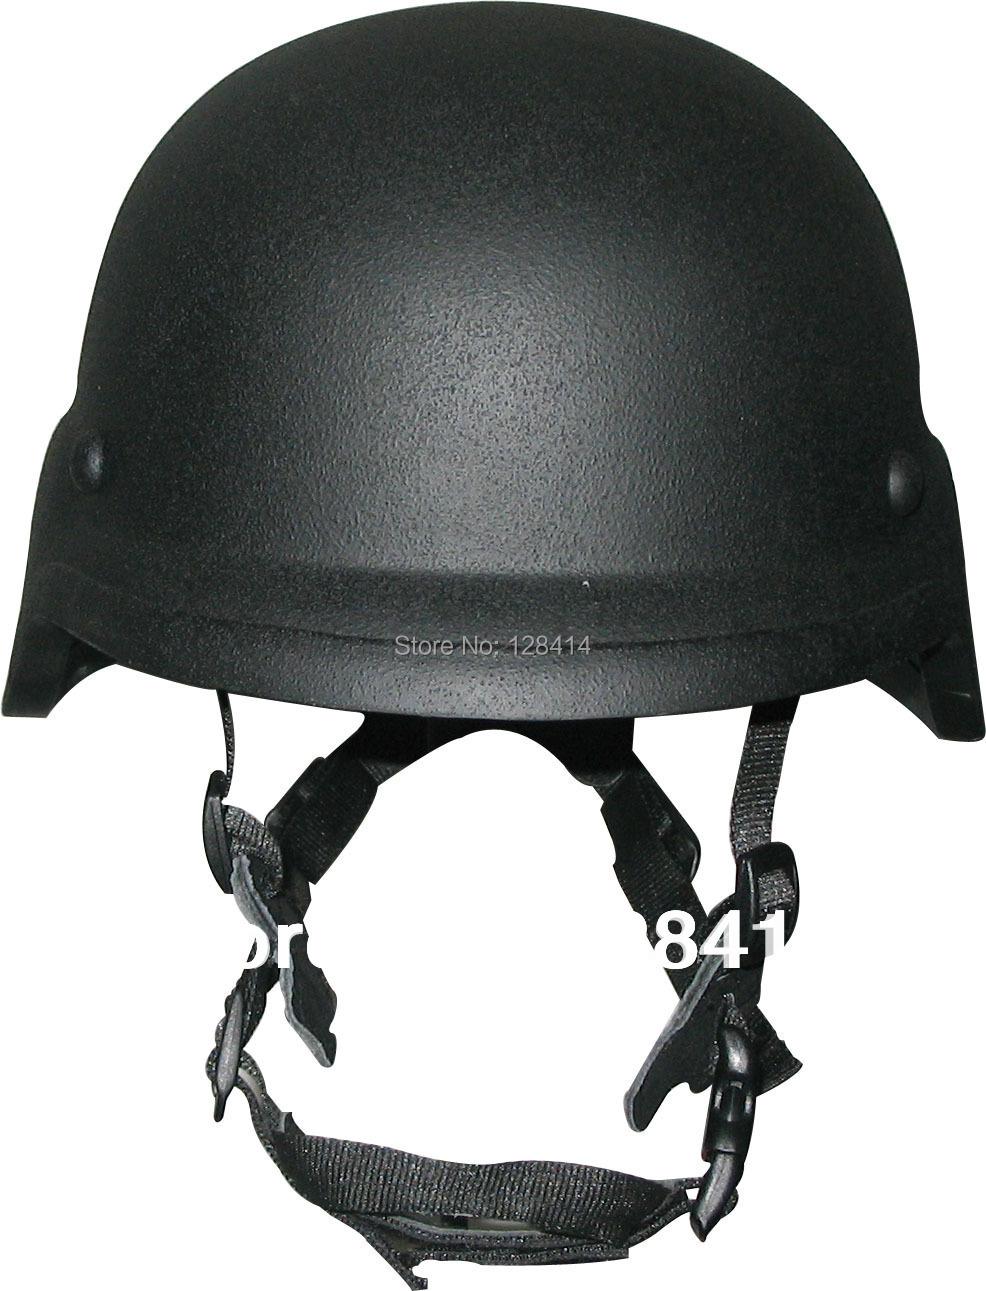 Black PASGT Style M88 Kevlar Bulletproof Helmet/NIJ 3A USA army anti ballistic helmet/Aramid M88 NIJ IIIA Bullet Proof Helmet